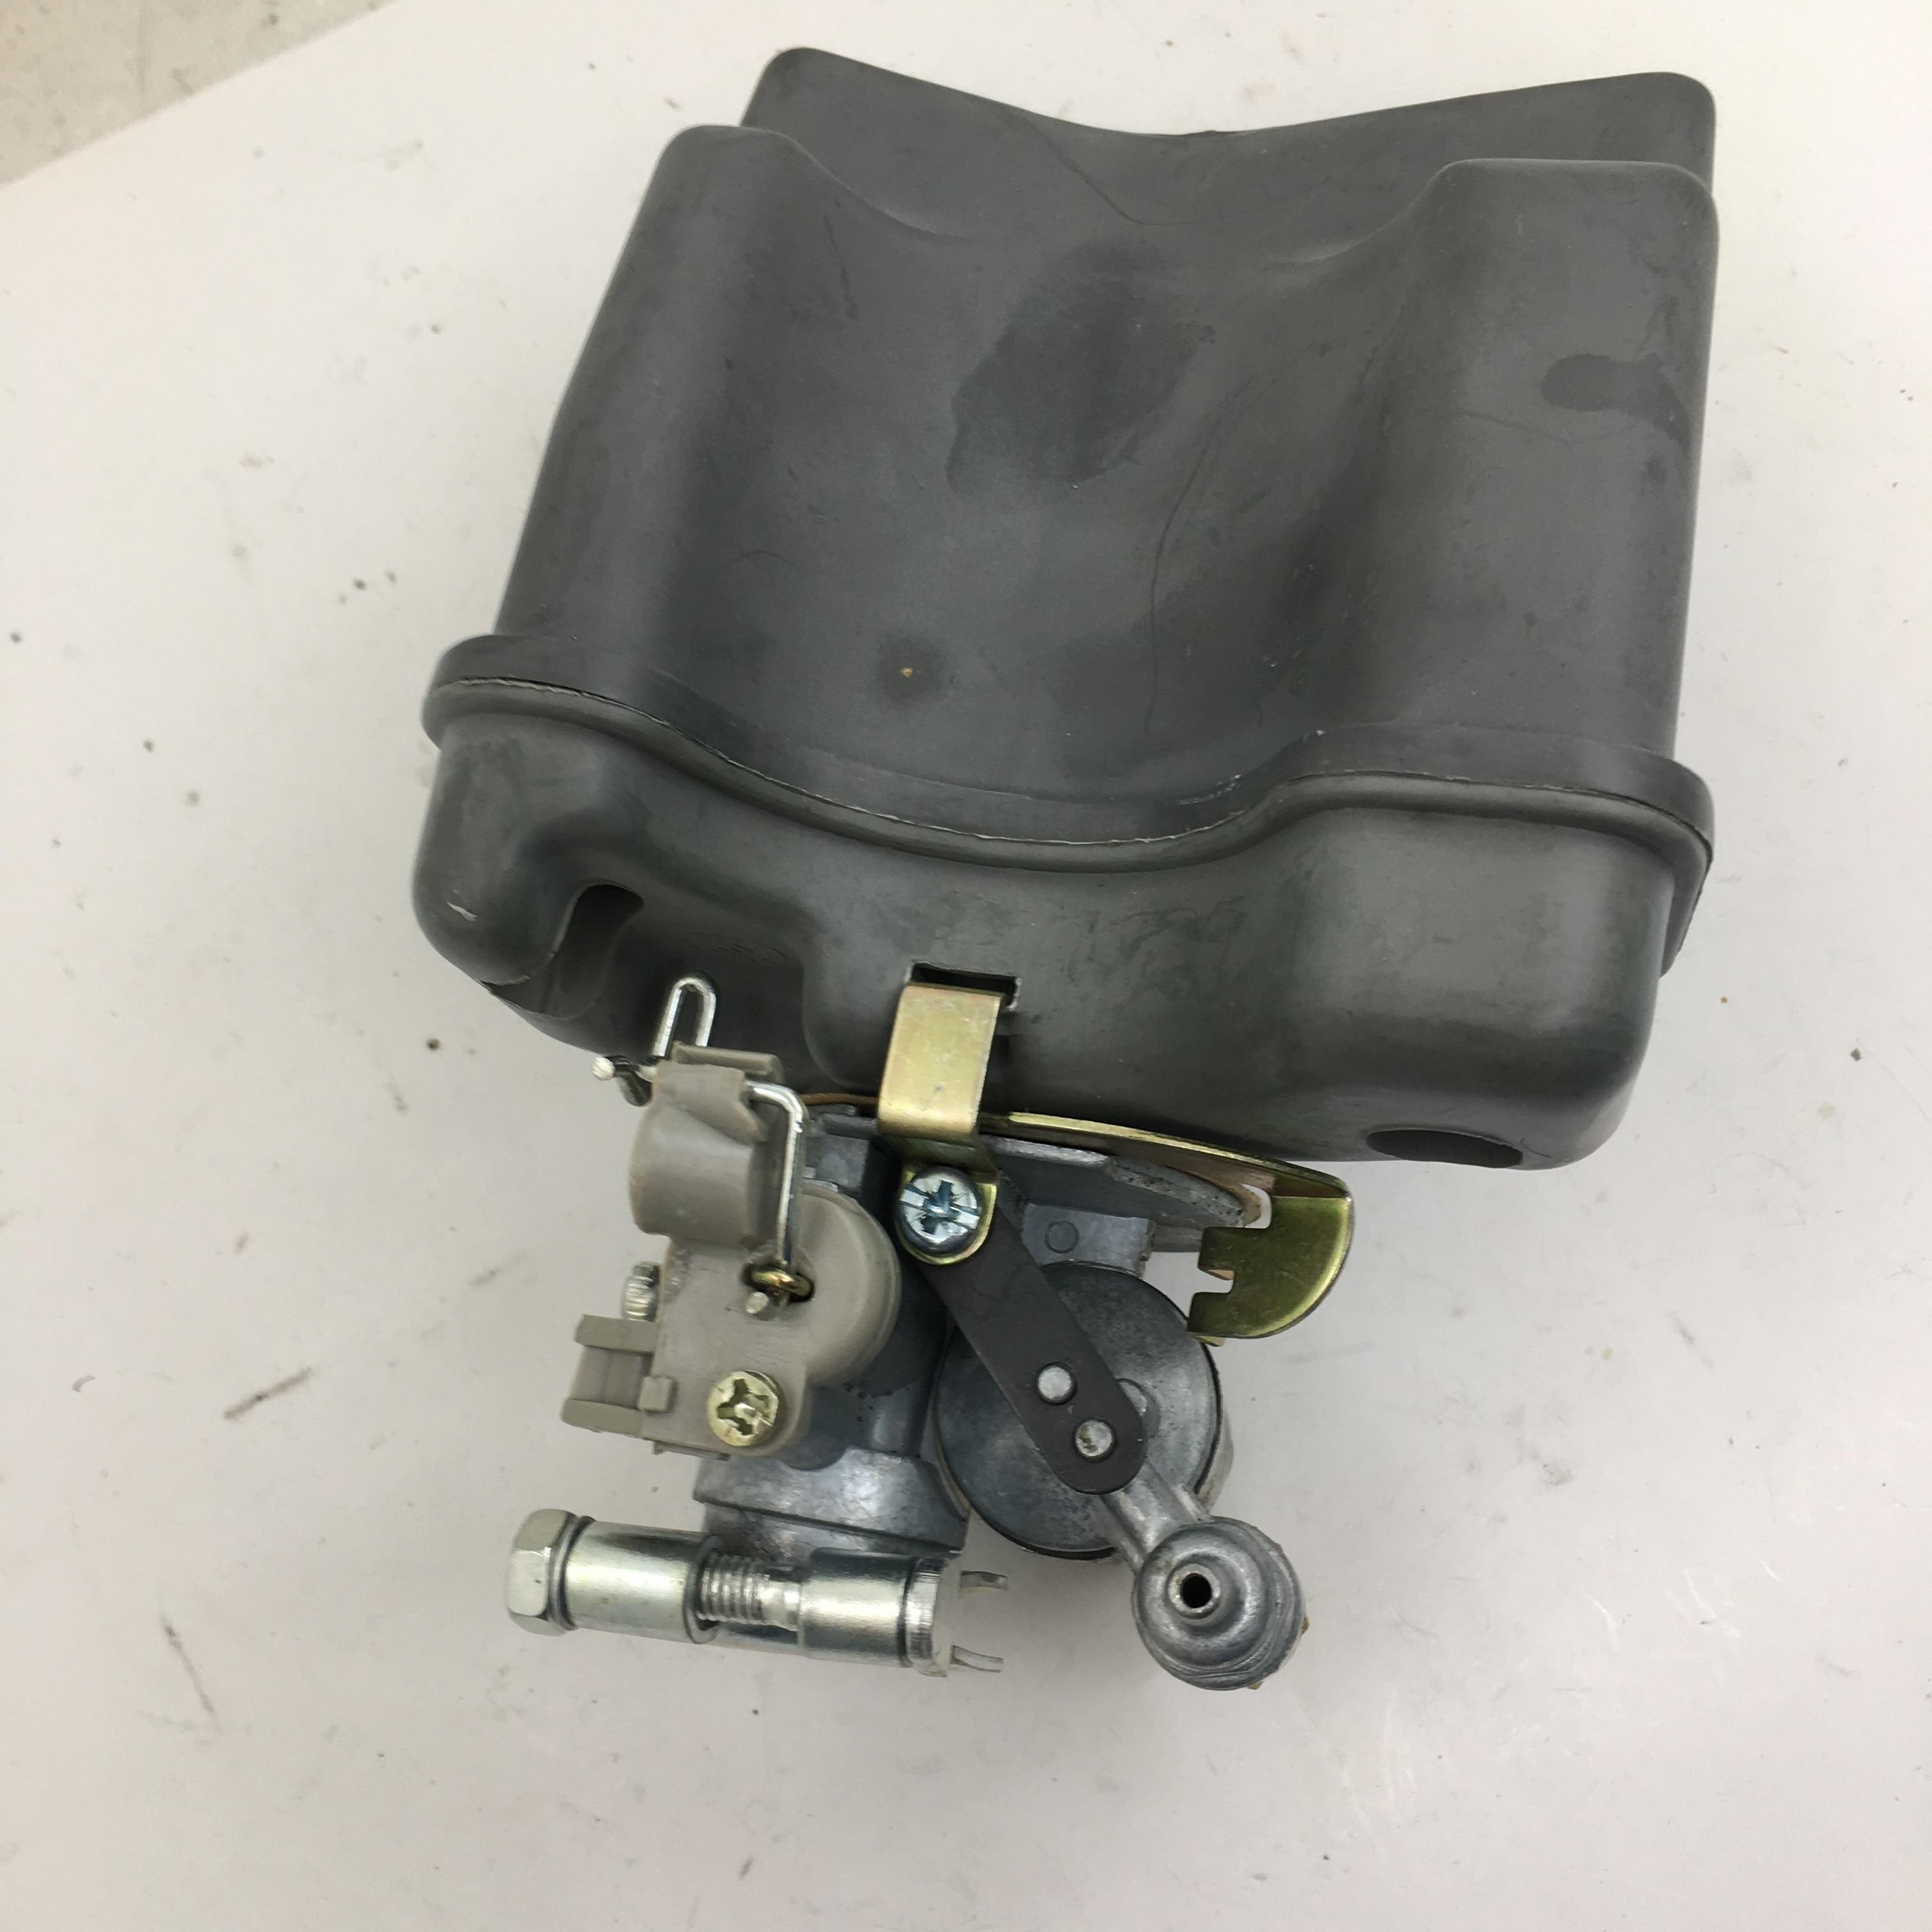 SherryBerg karbonhidrat karbüratör karbüratör vergaser yeni karbüratör carb yedek moped/cep fit peugeot 103 Gurtner tarzı 12mm